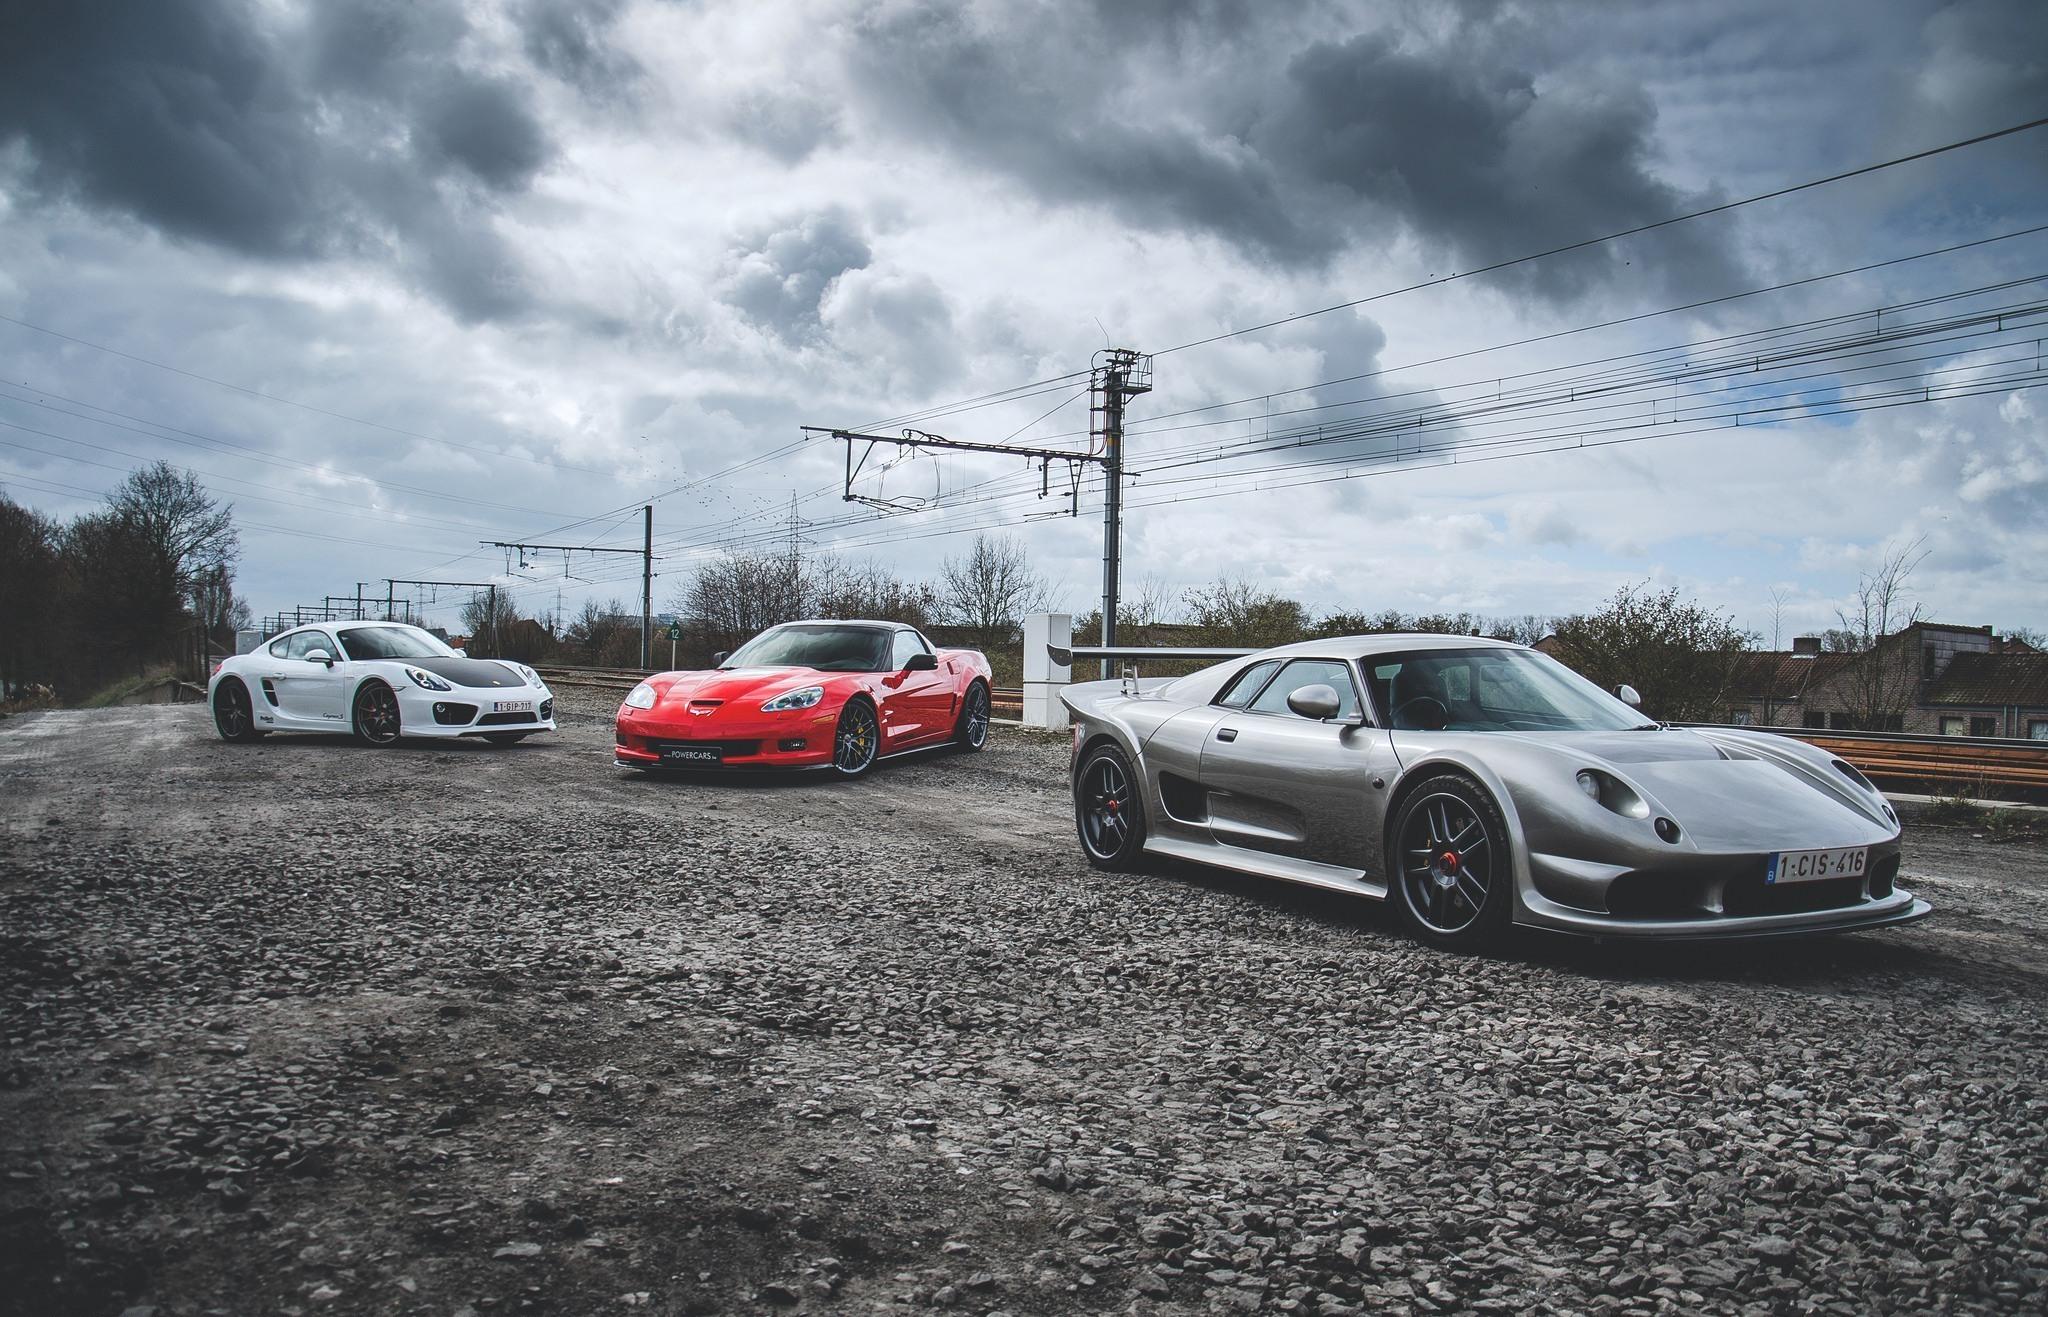 62744 скачать обои Порш (Porsche), Тачки (Cars), Corvette, Zr1, Улица, Cayman S, Noble, M12, Gto 3R - заставки и картинки бесплатно